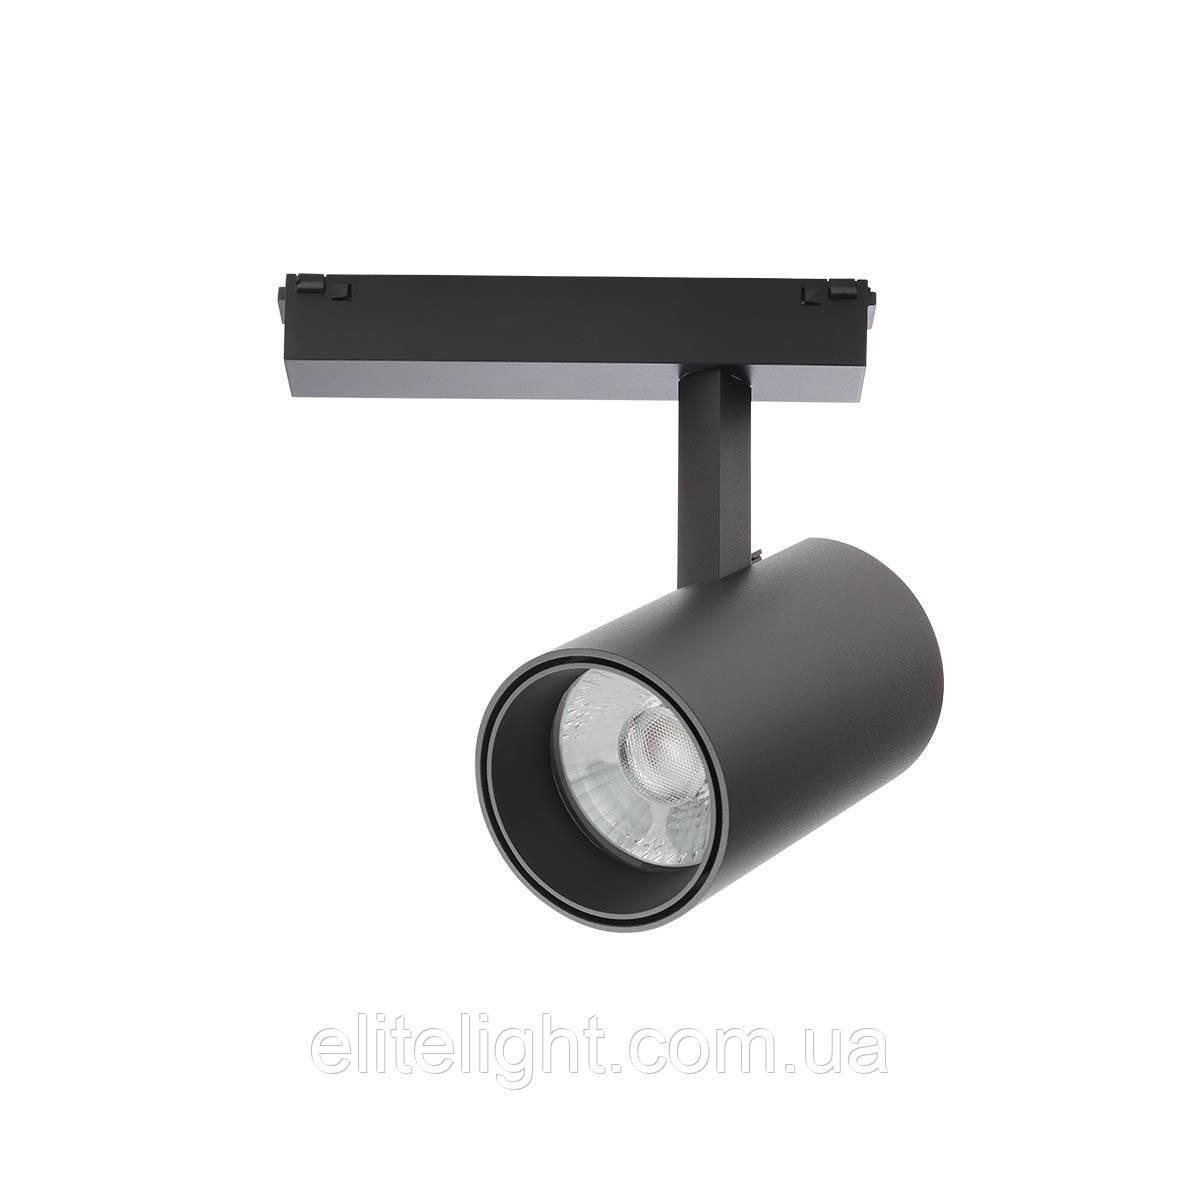 Прожектор для трека Arelux XCLICK M SPOT LIGHT + DALI